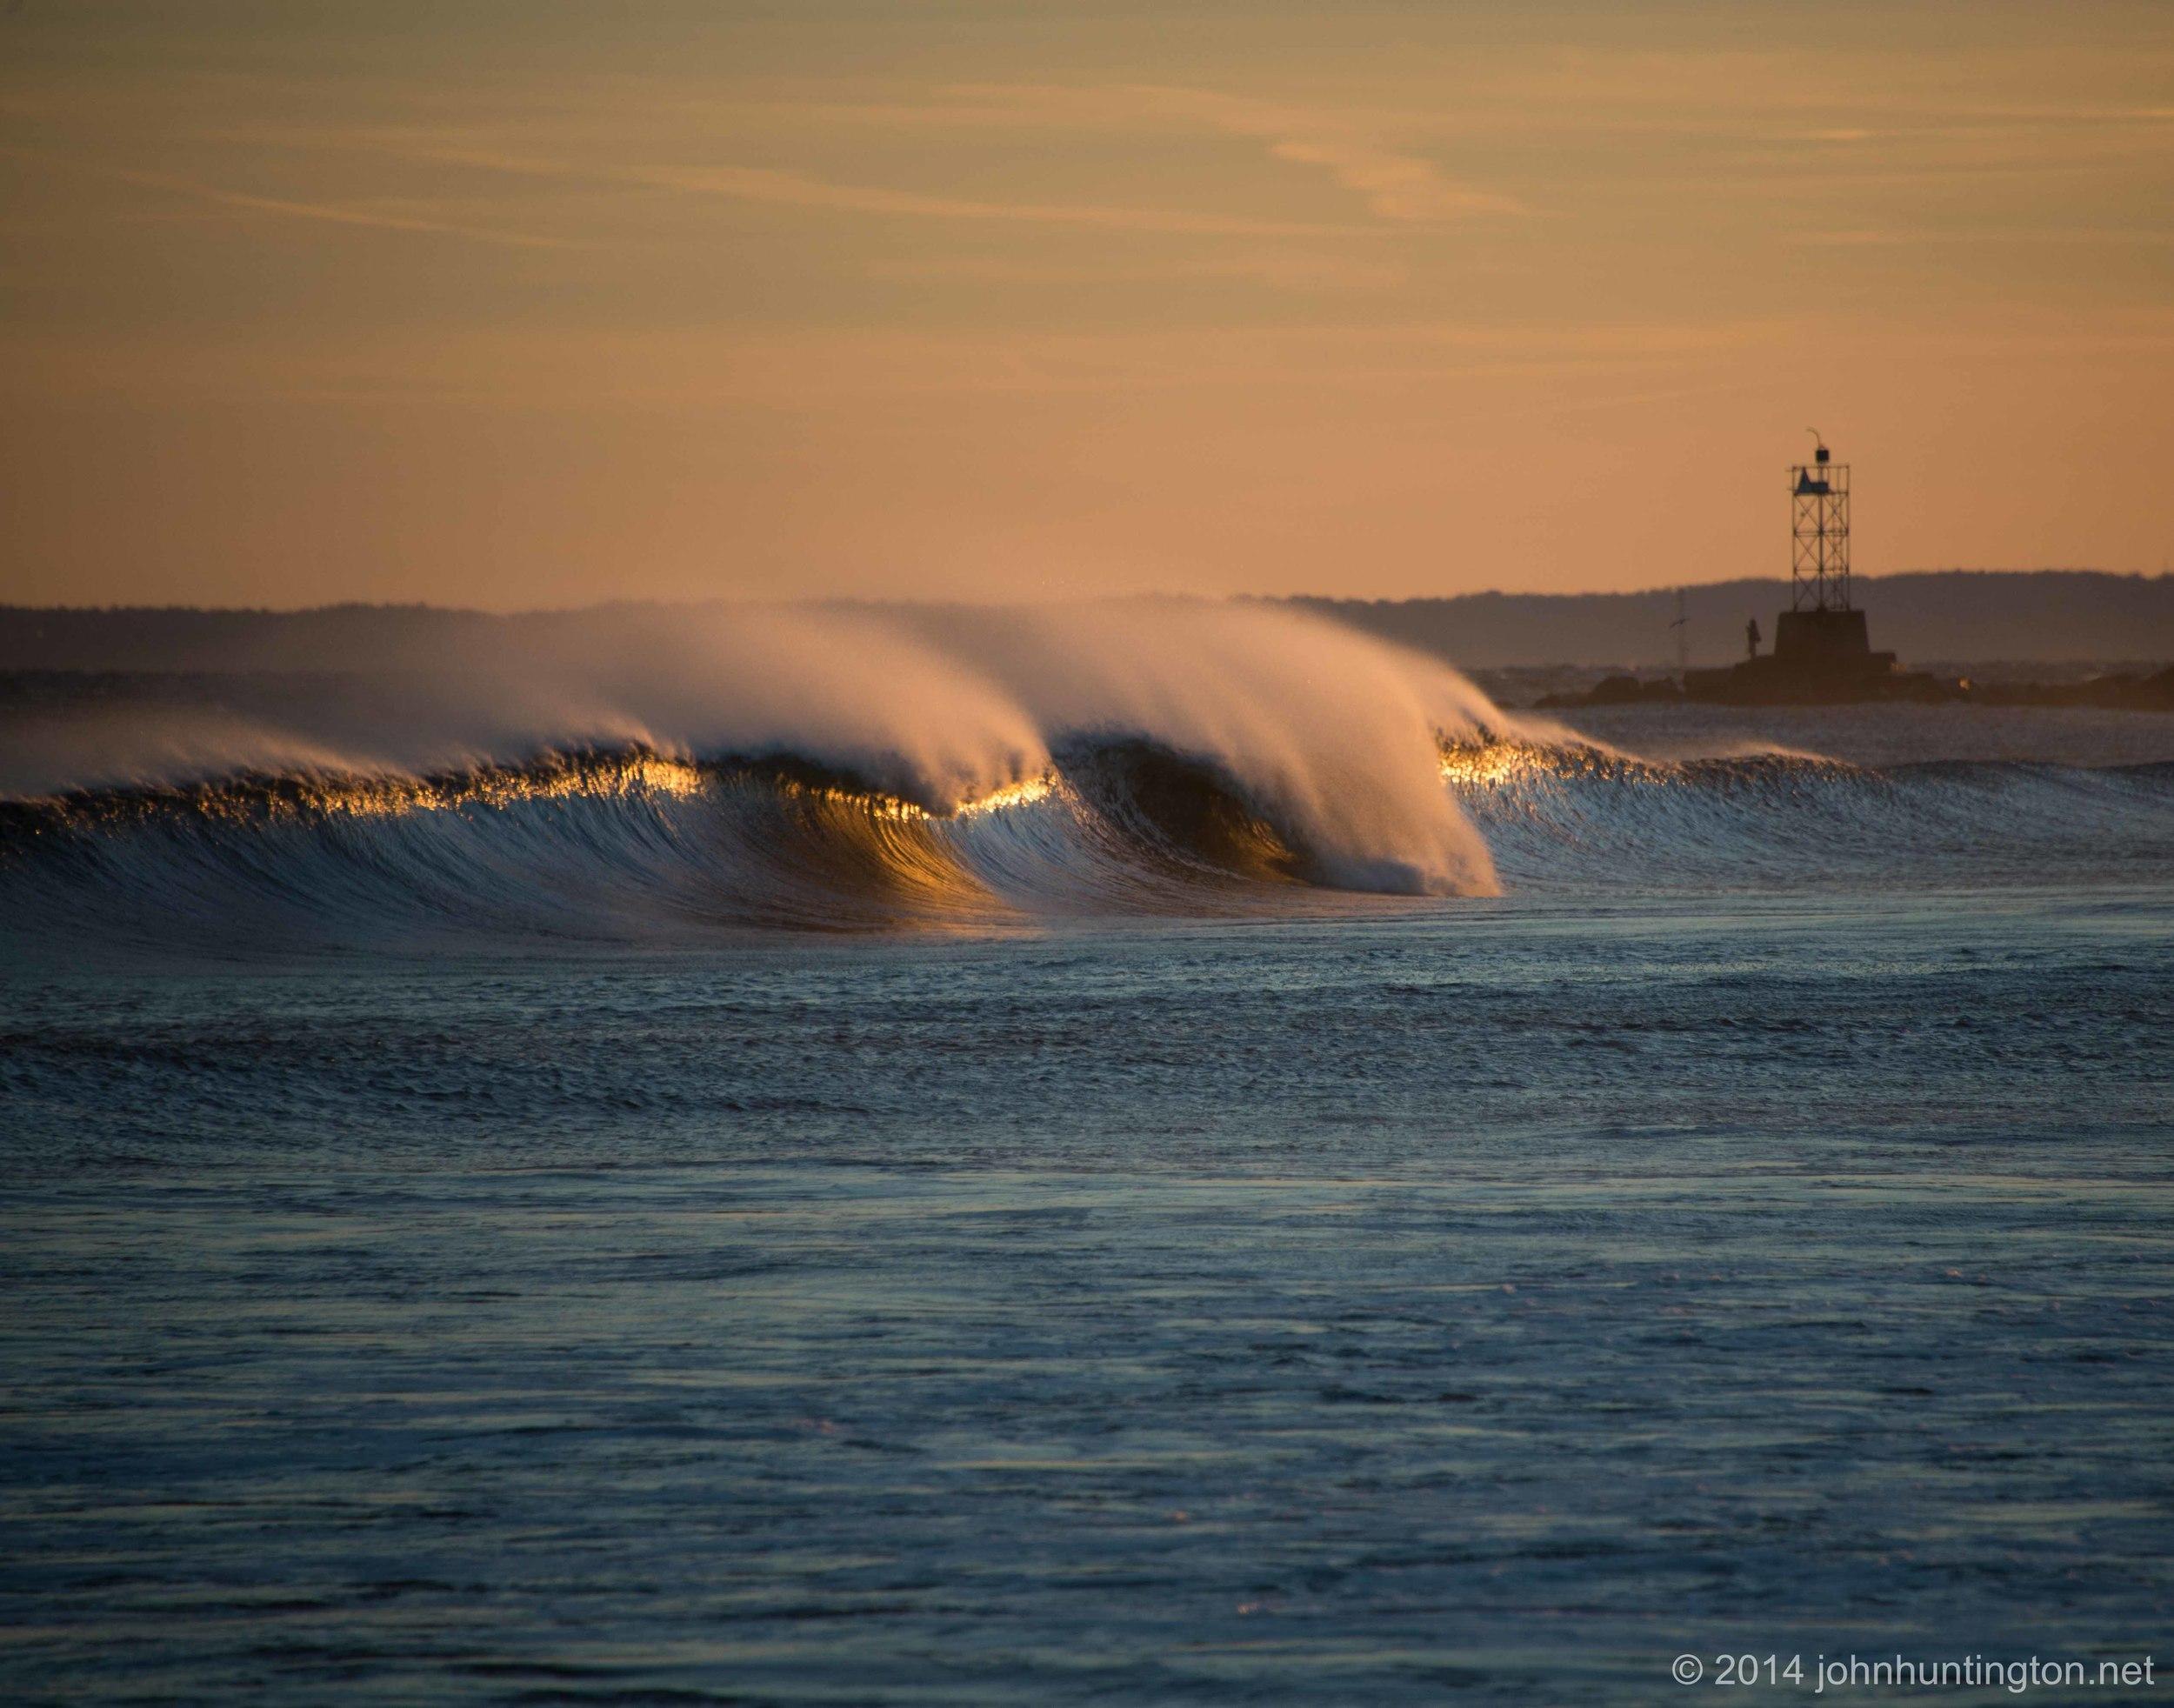 Huntington-20141019-DSC_3783.jpg